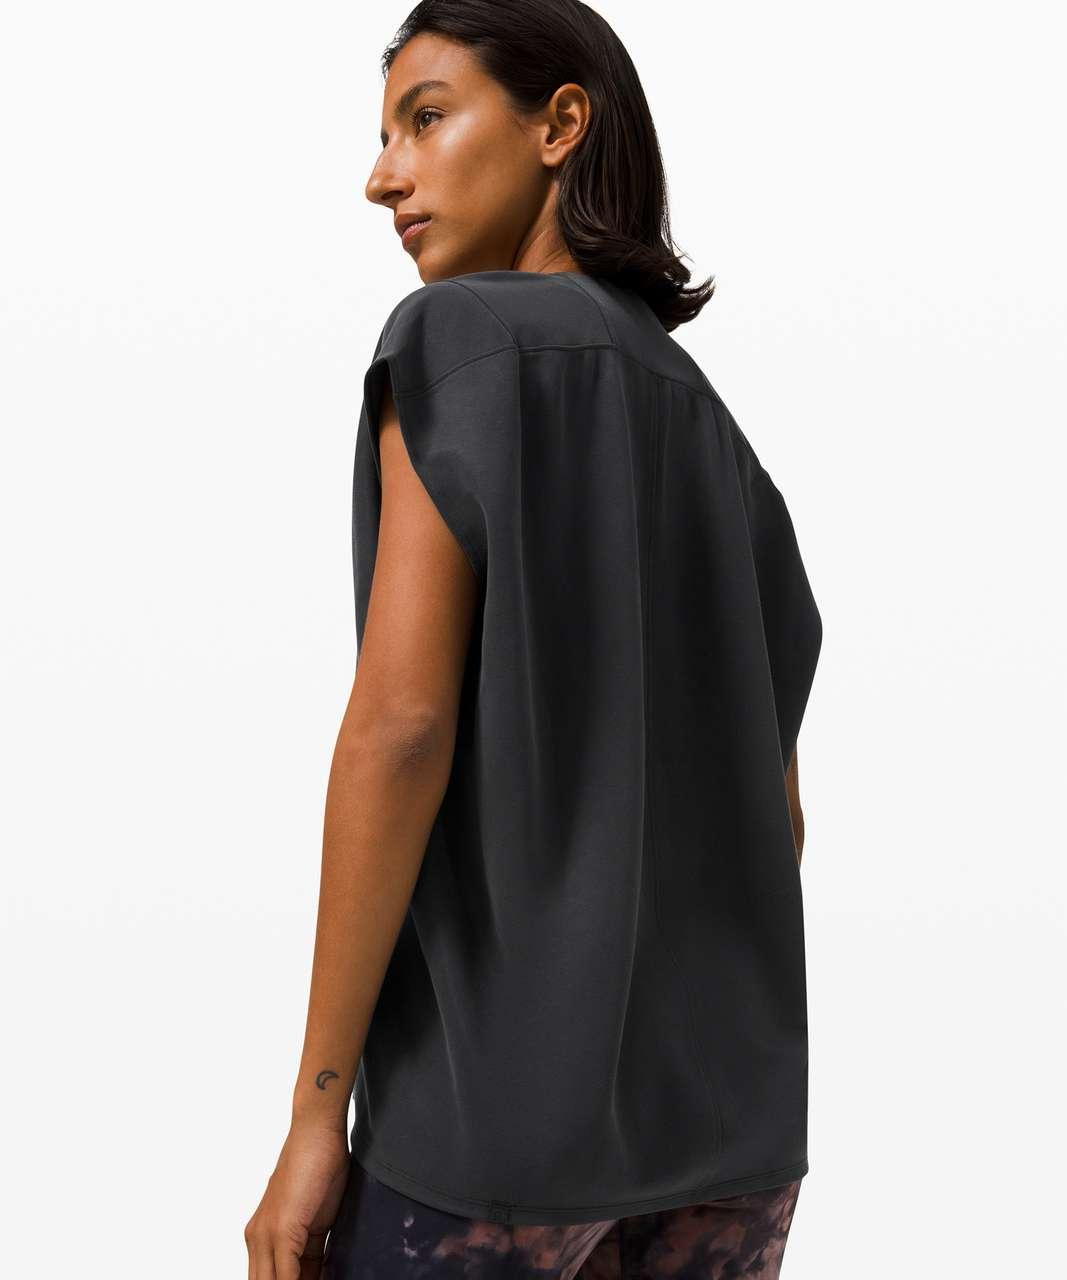 Lululemon Capped Short Sleeve Tee - Black